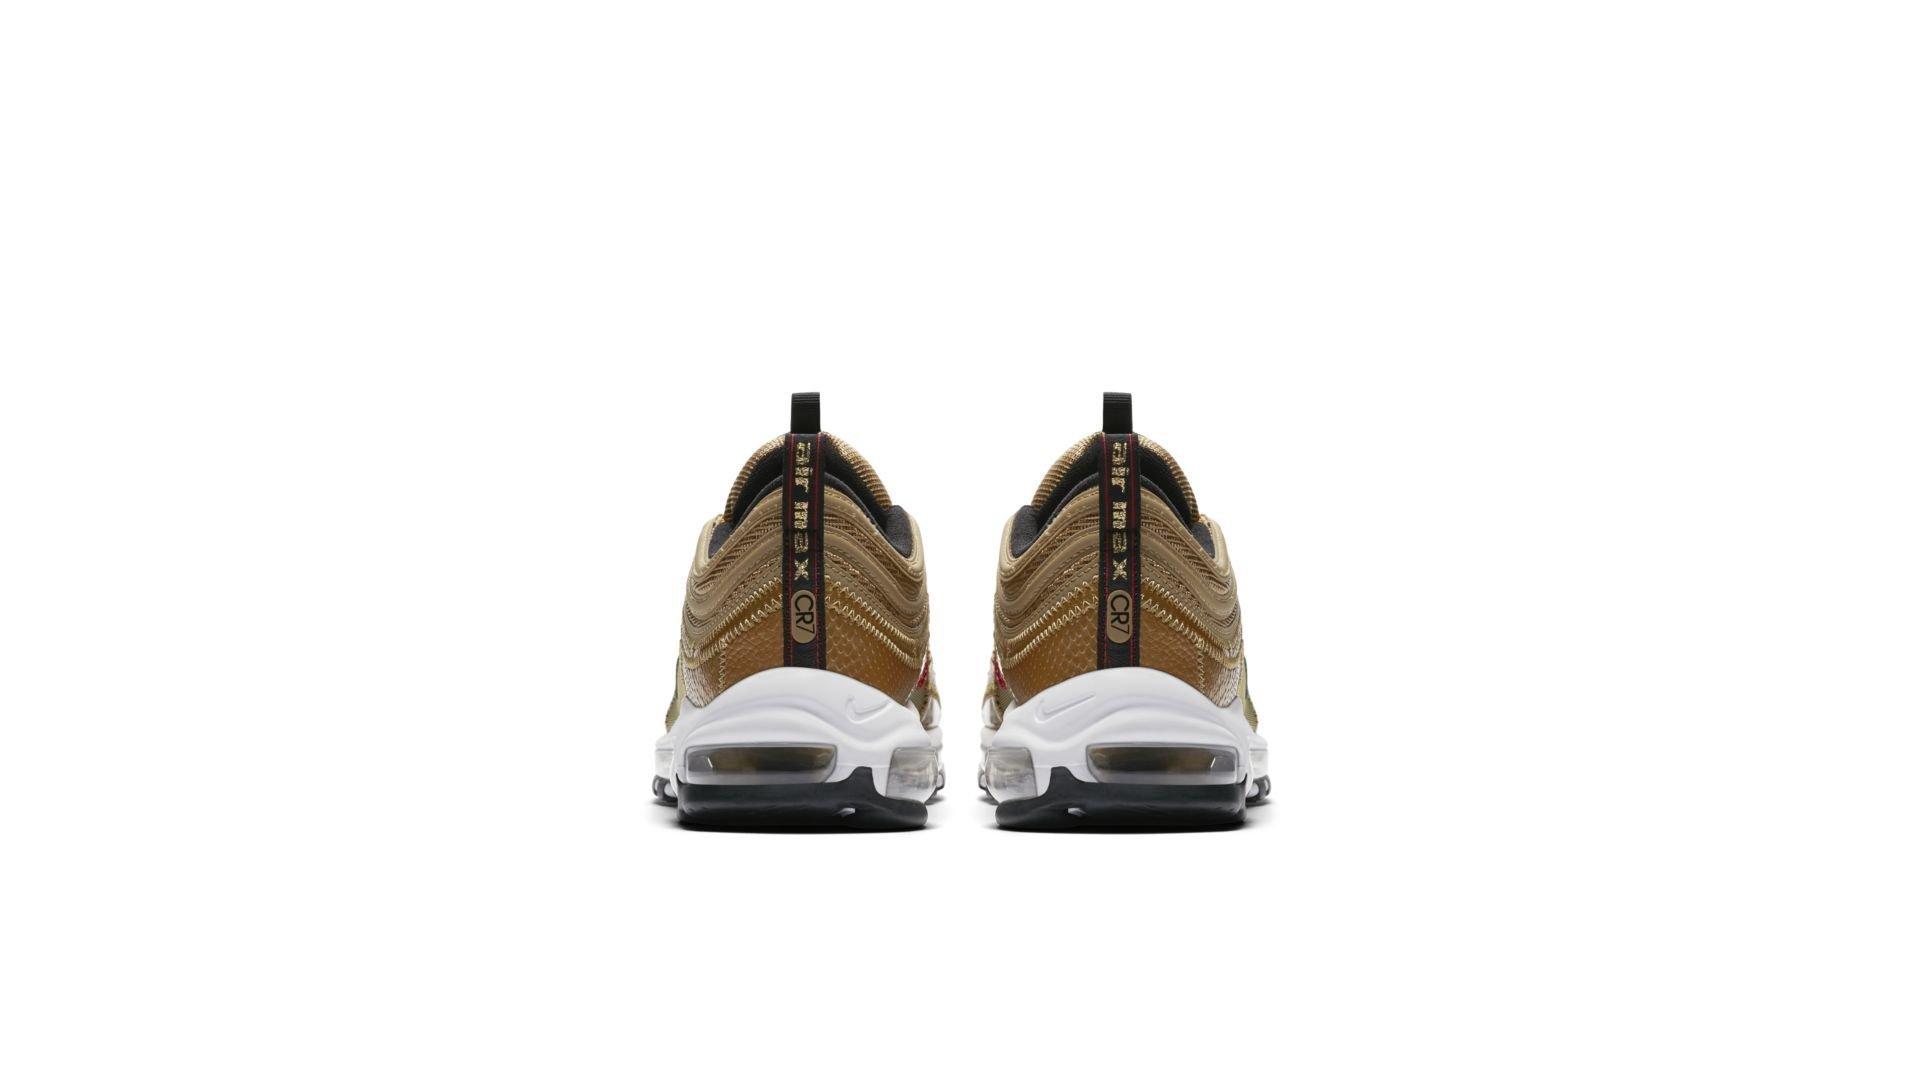 Nike Air Max 97 Metallic Gold 2017 Release Date | SneakerFiles